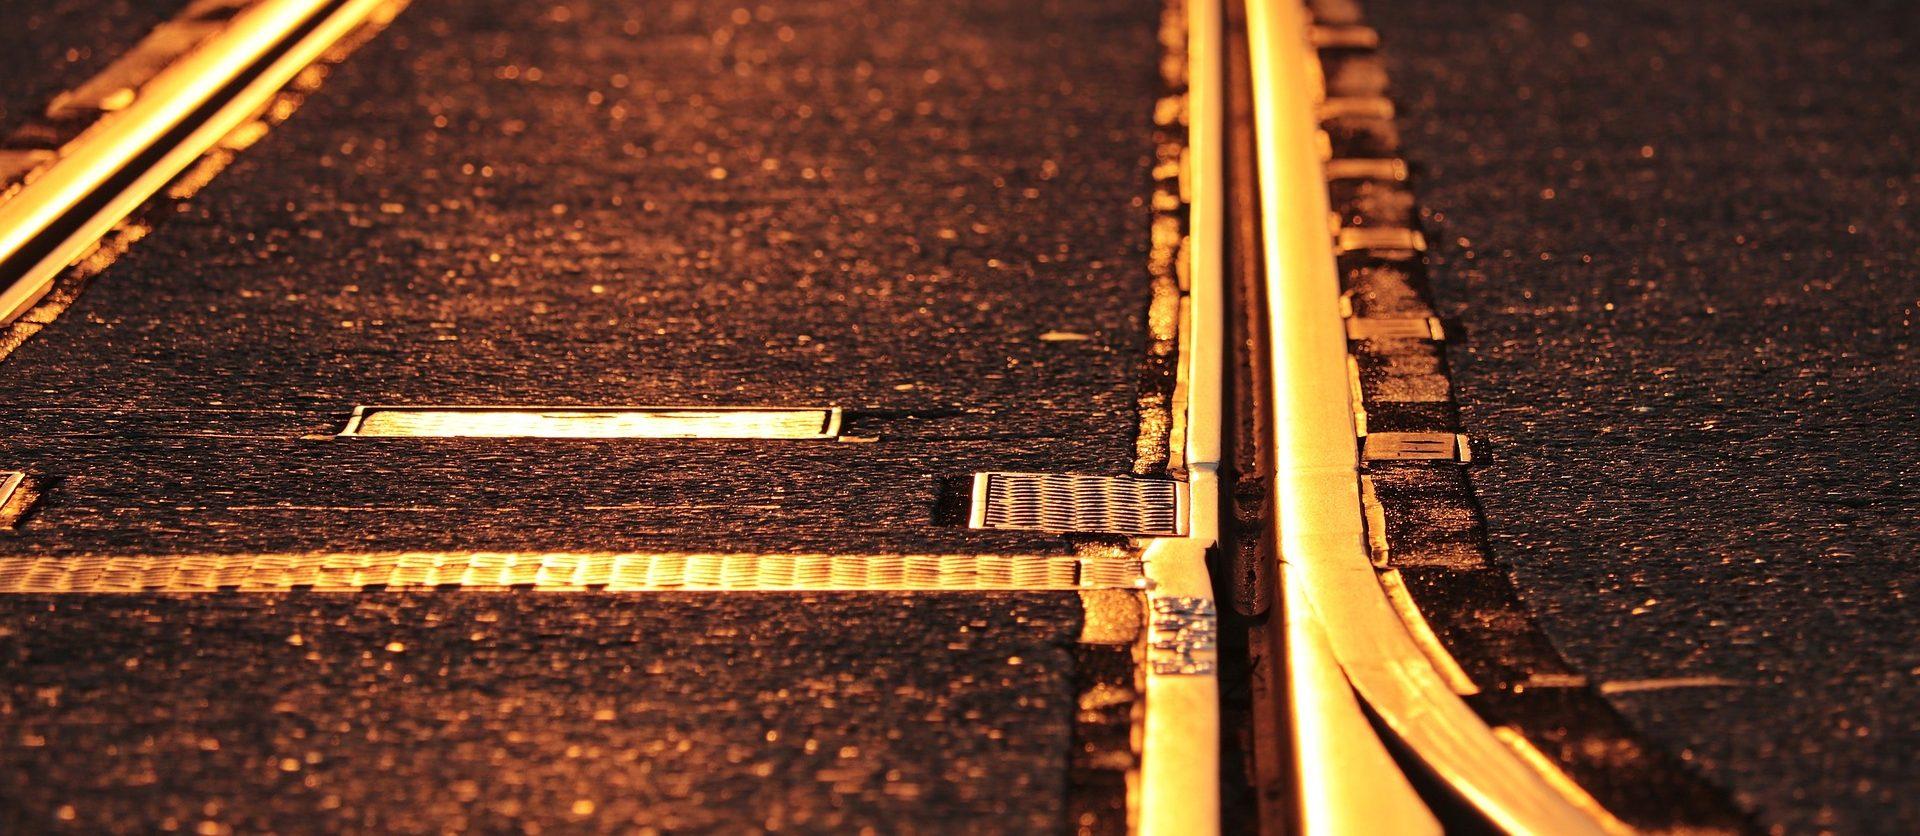 rail-3678287_1920